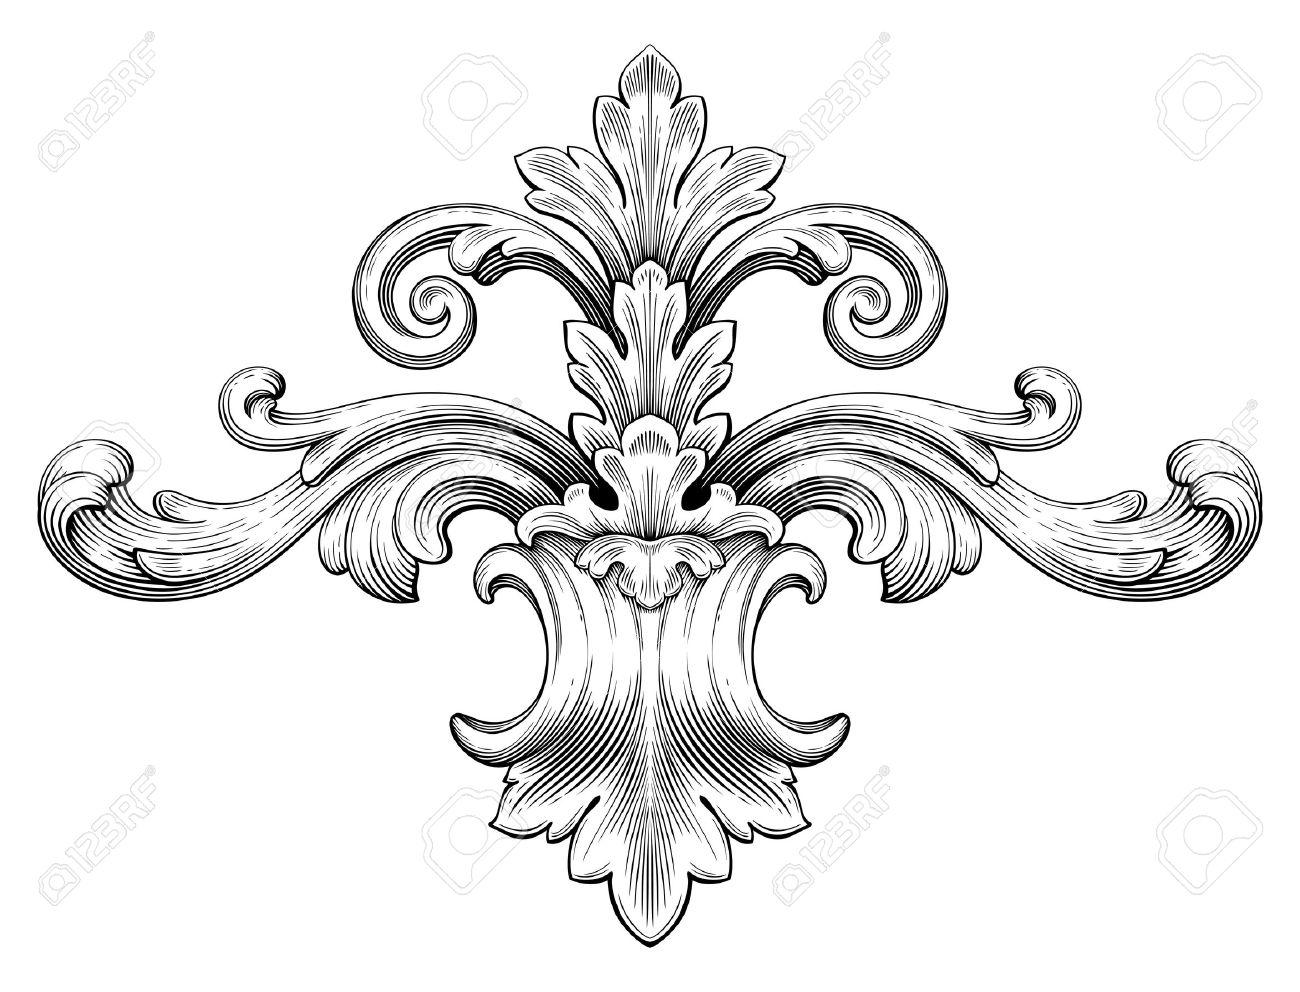 Vintage baroque frame leaf scroll floral ornament engraving border retro pattern antique style swirl decorative design element black and white filigree vector - 36203984